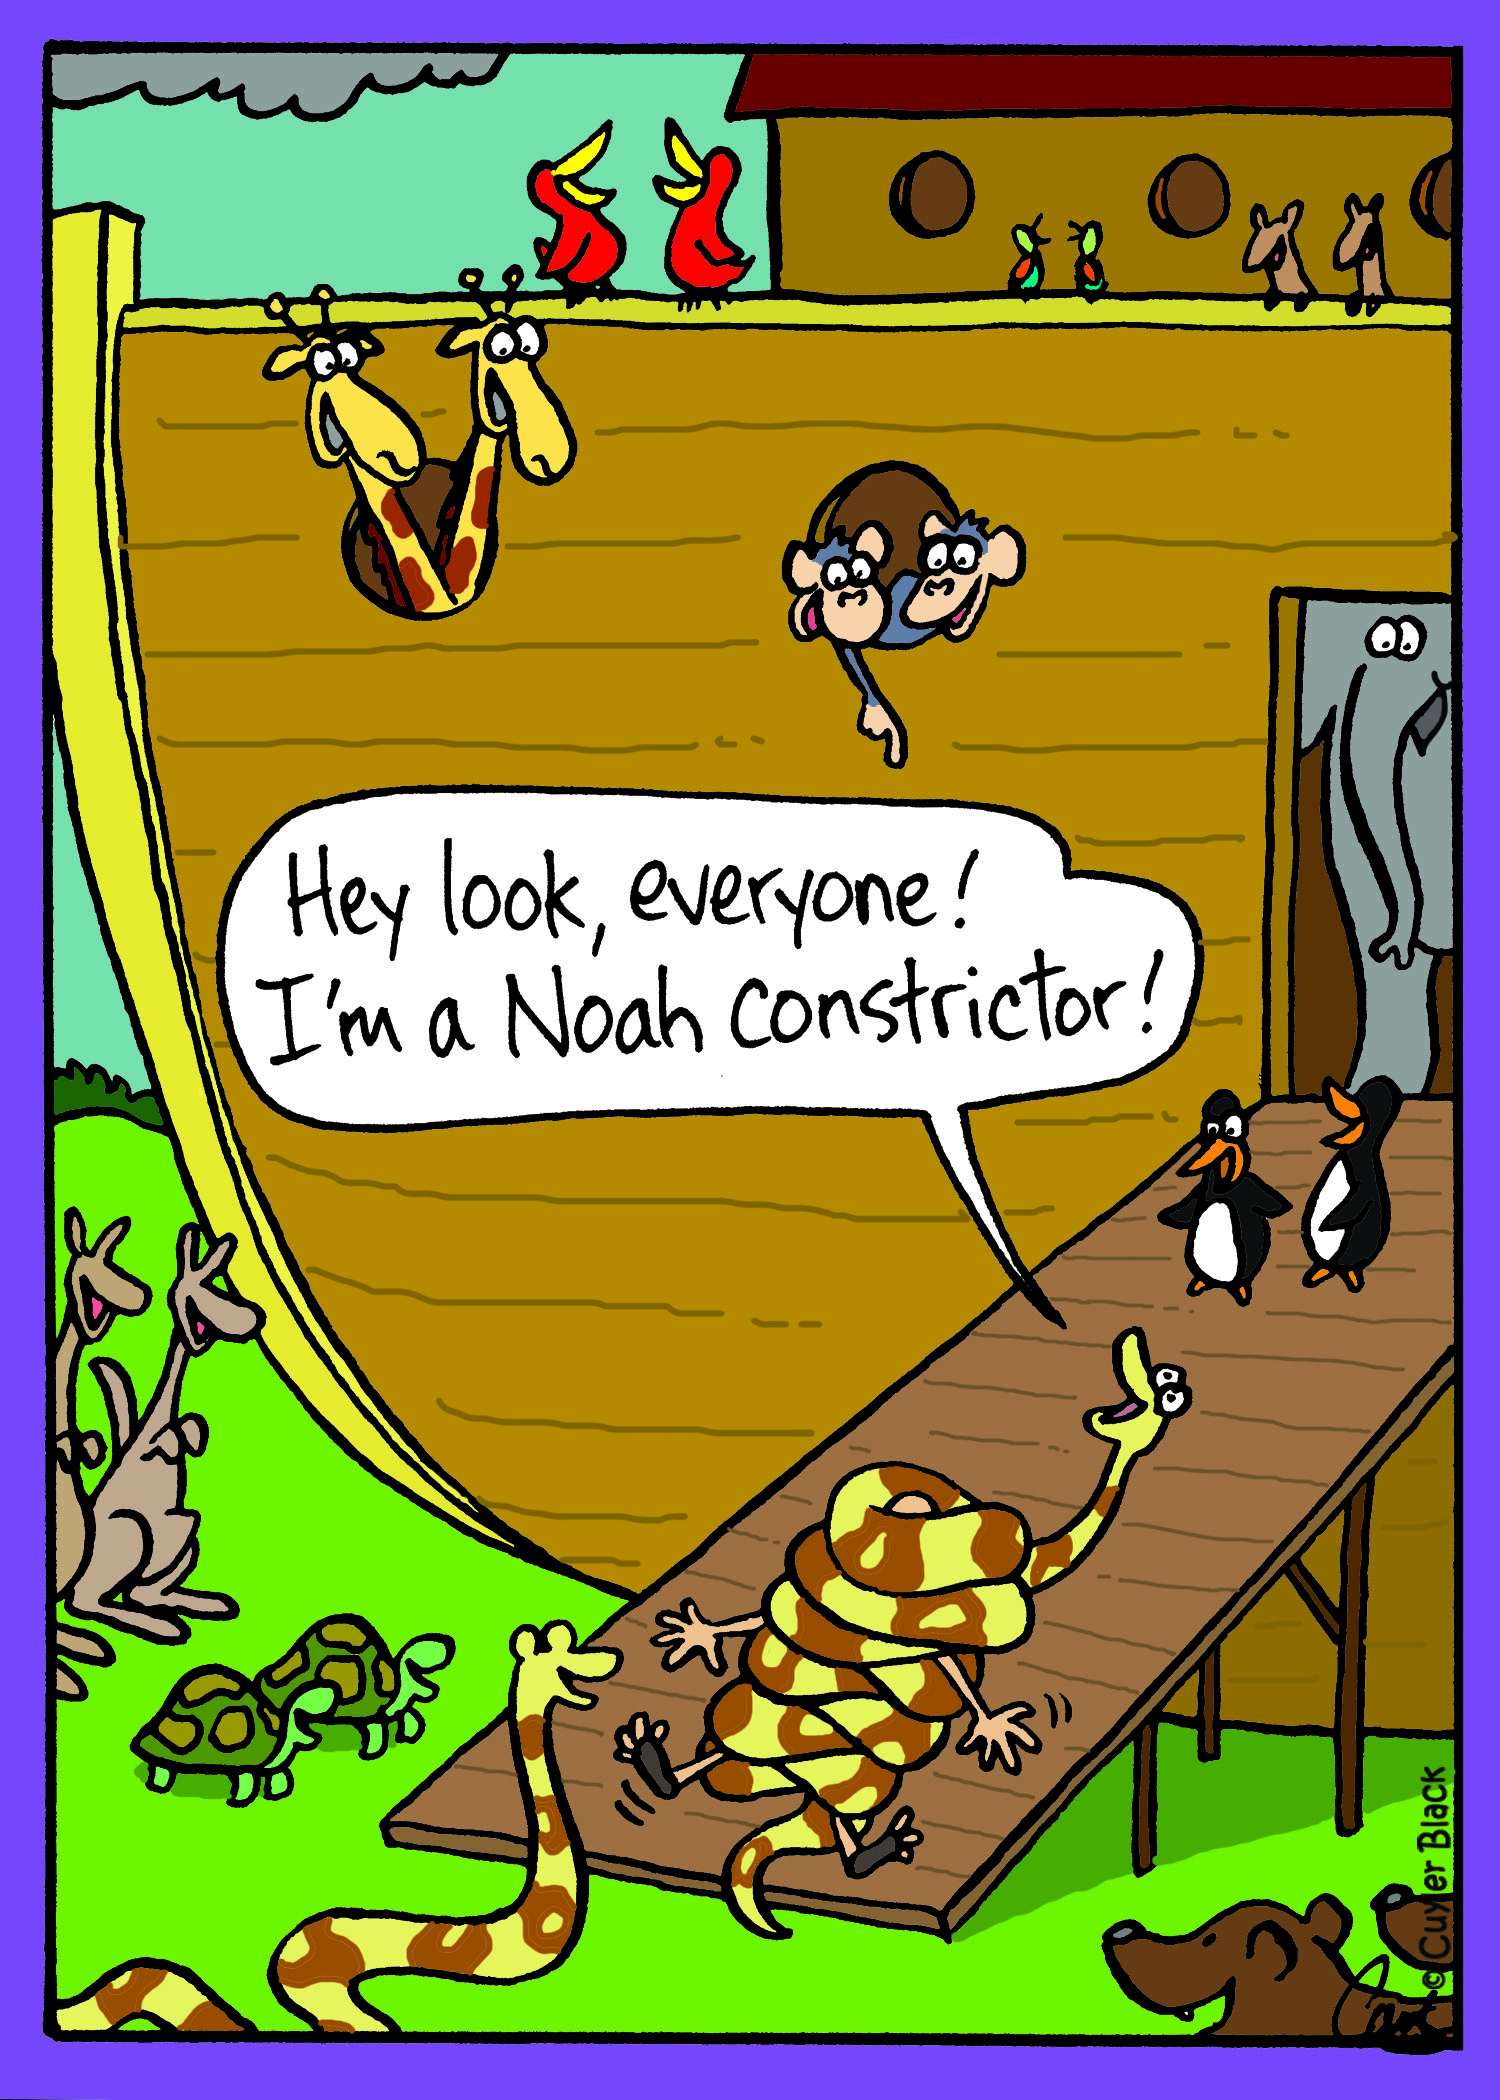 Noah constrictor.jpg